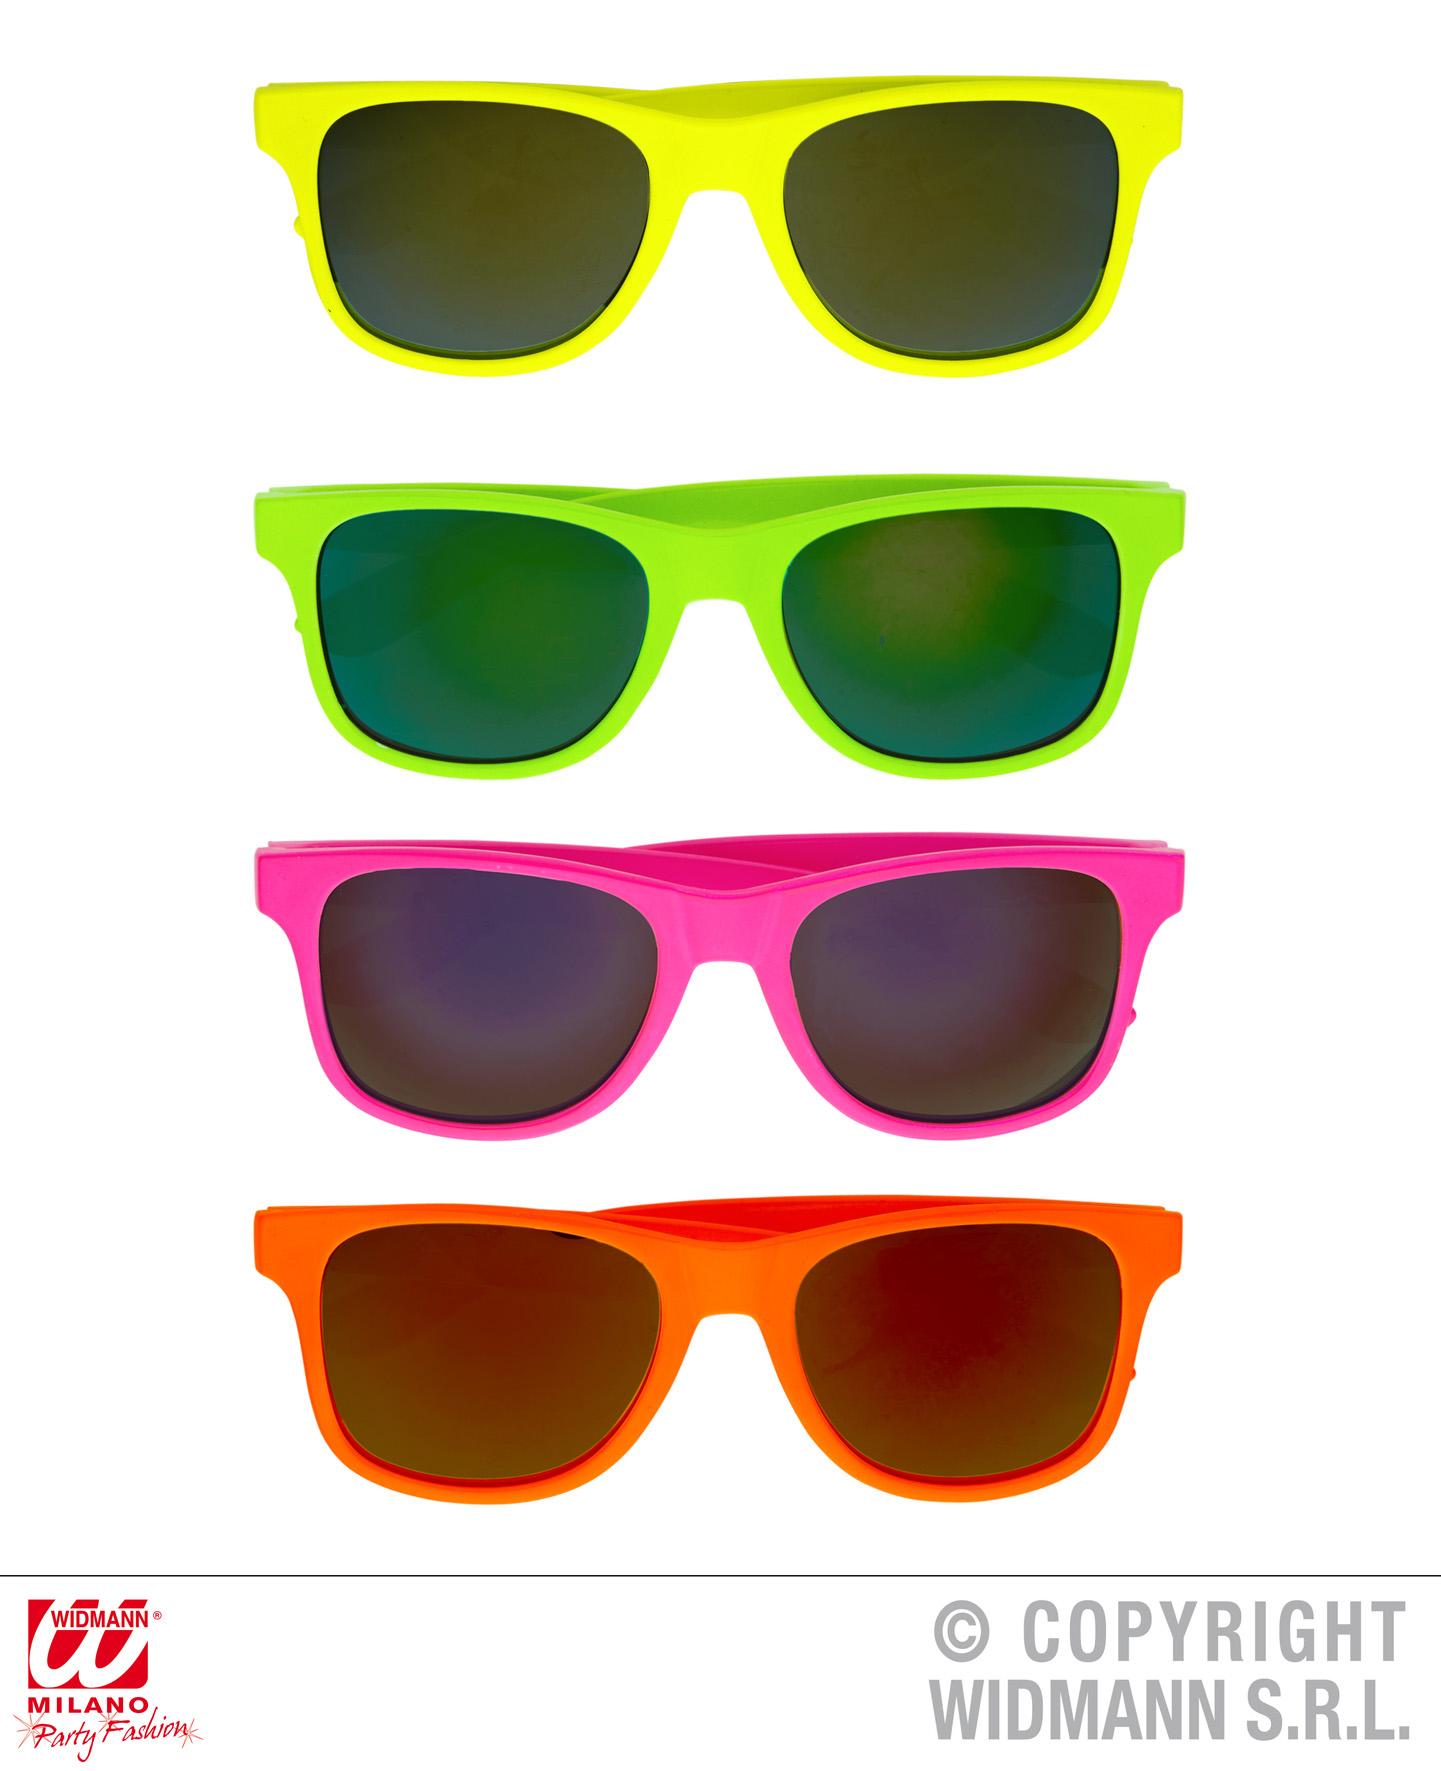 Fluo lunettes wayfarer effet miroir ann es 80 ans rose for Effet miroir psychologie definition